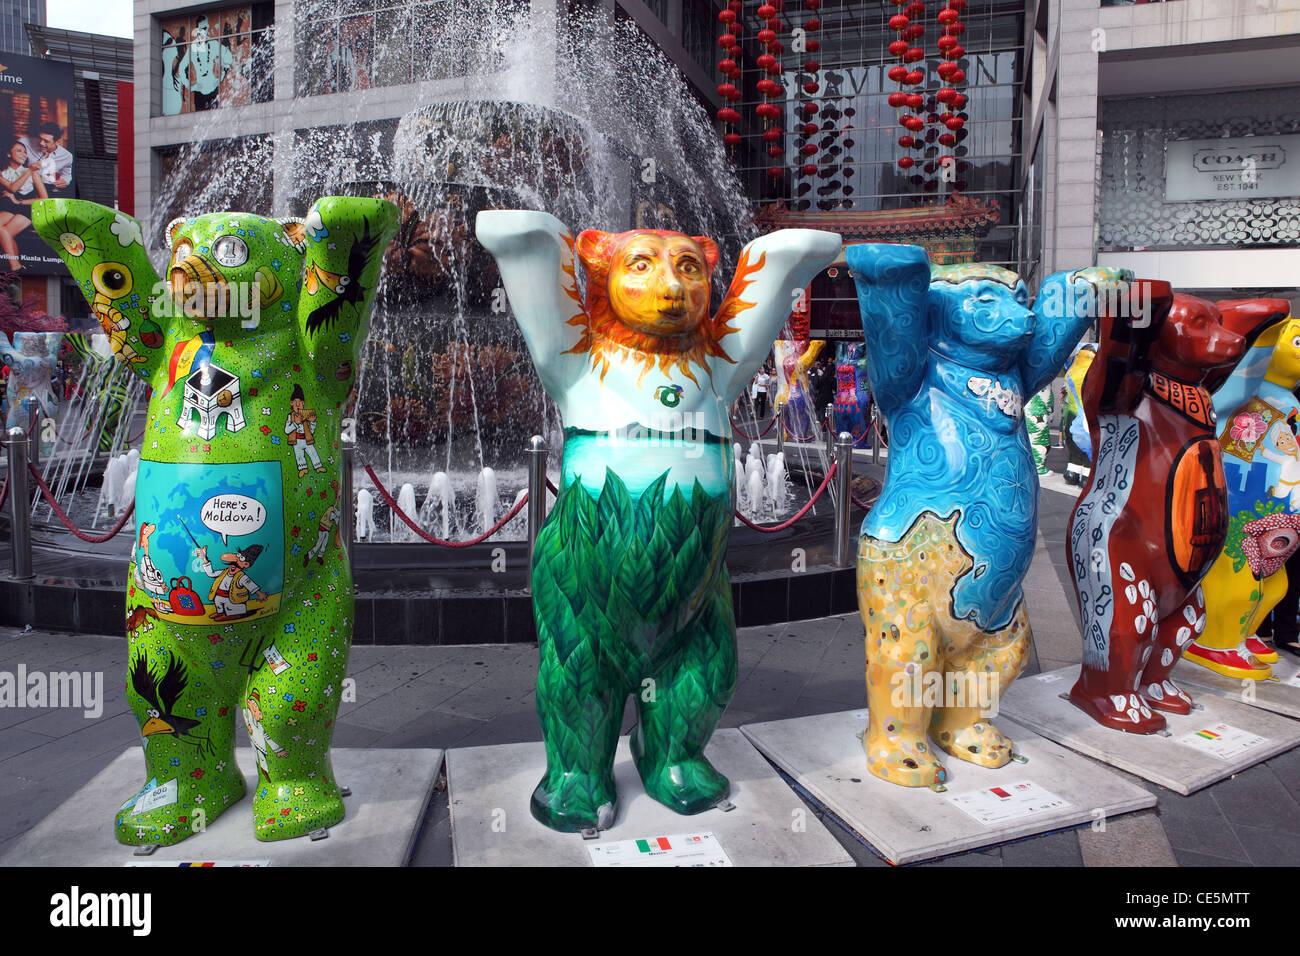 United Buddy Bears worldwide peace exhibition. Kuala Lumpur, Wilayah Persekutuan, Malaysia, South-East Asia, Asia - Stock Image